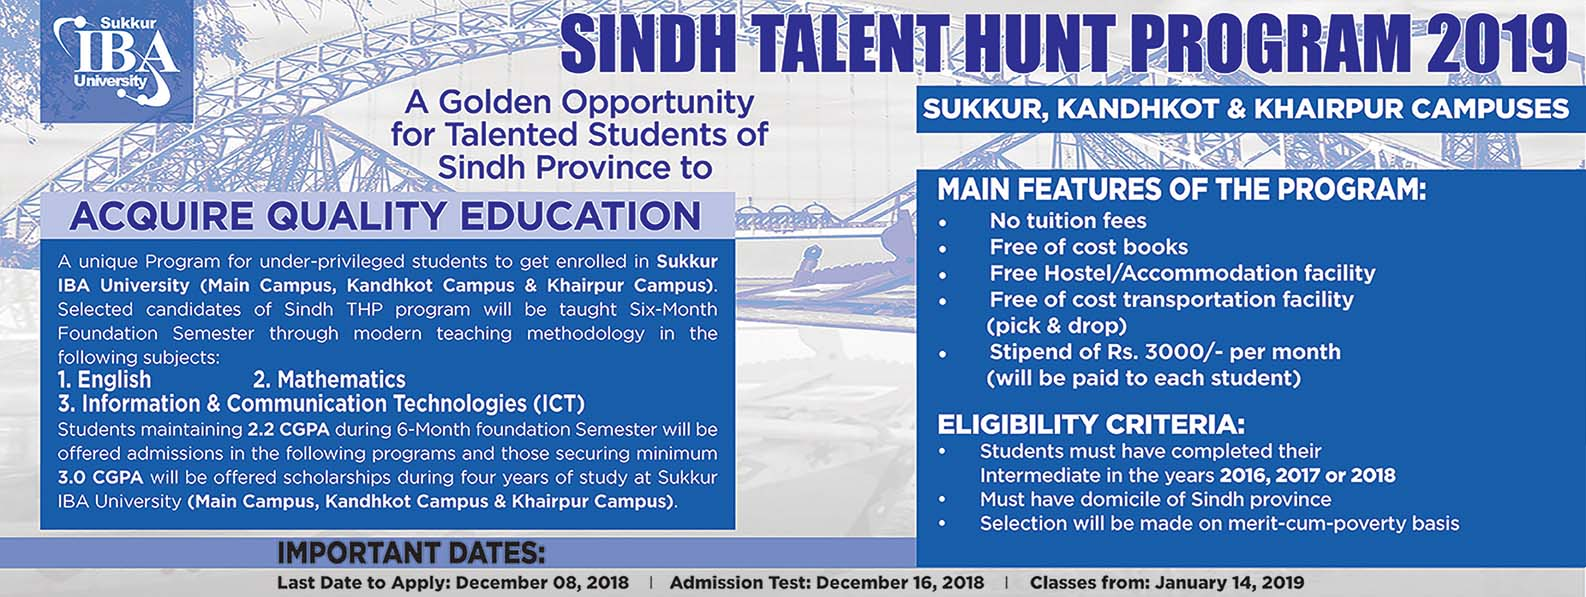 IBA Sukkur Talent Hunt Program 2019 Form, Last Date, Test Result